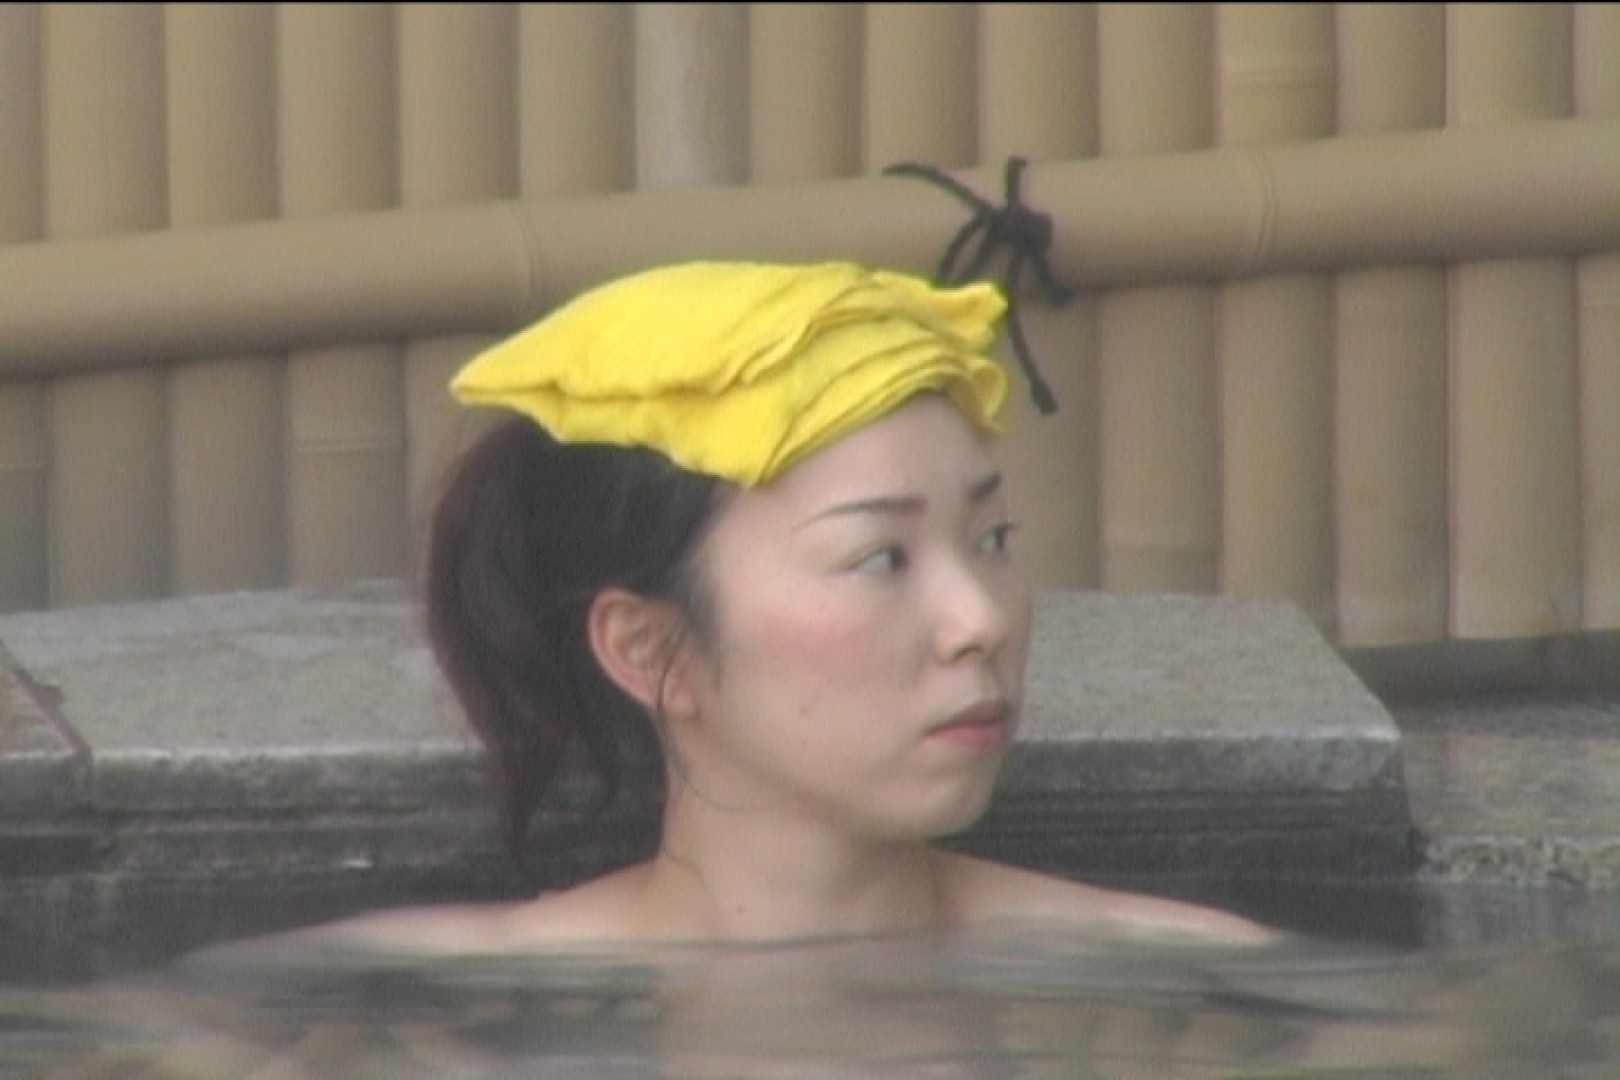 Aquaな露天風呂Vol.529 盗撮シリーズ | 露天風呂編  106PIX 41